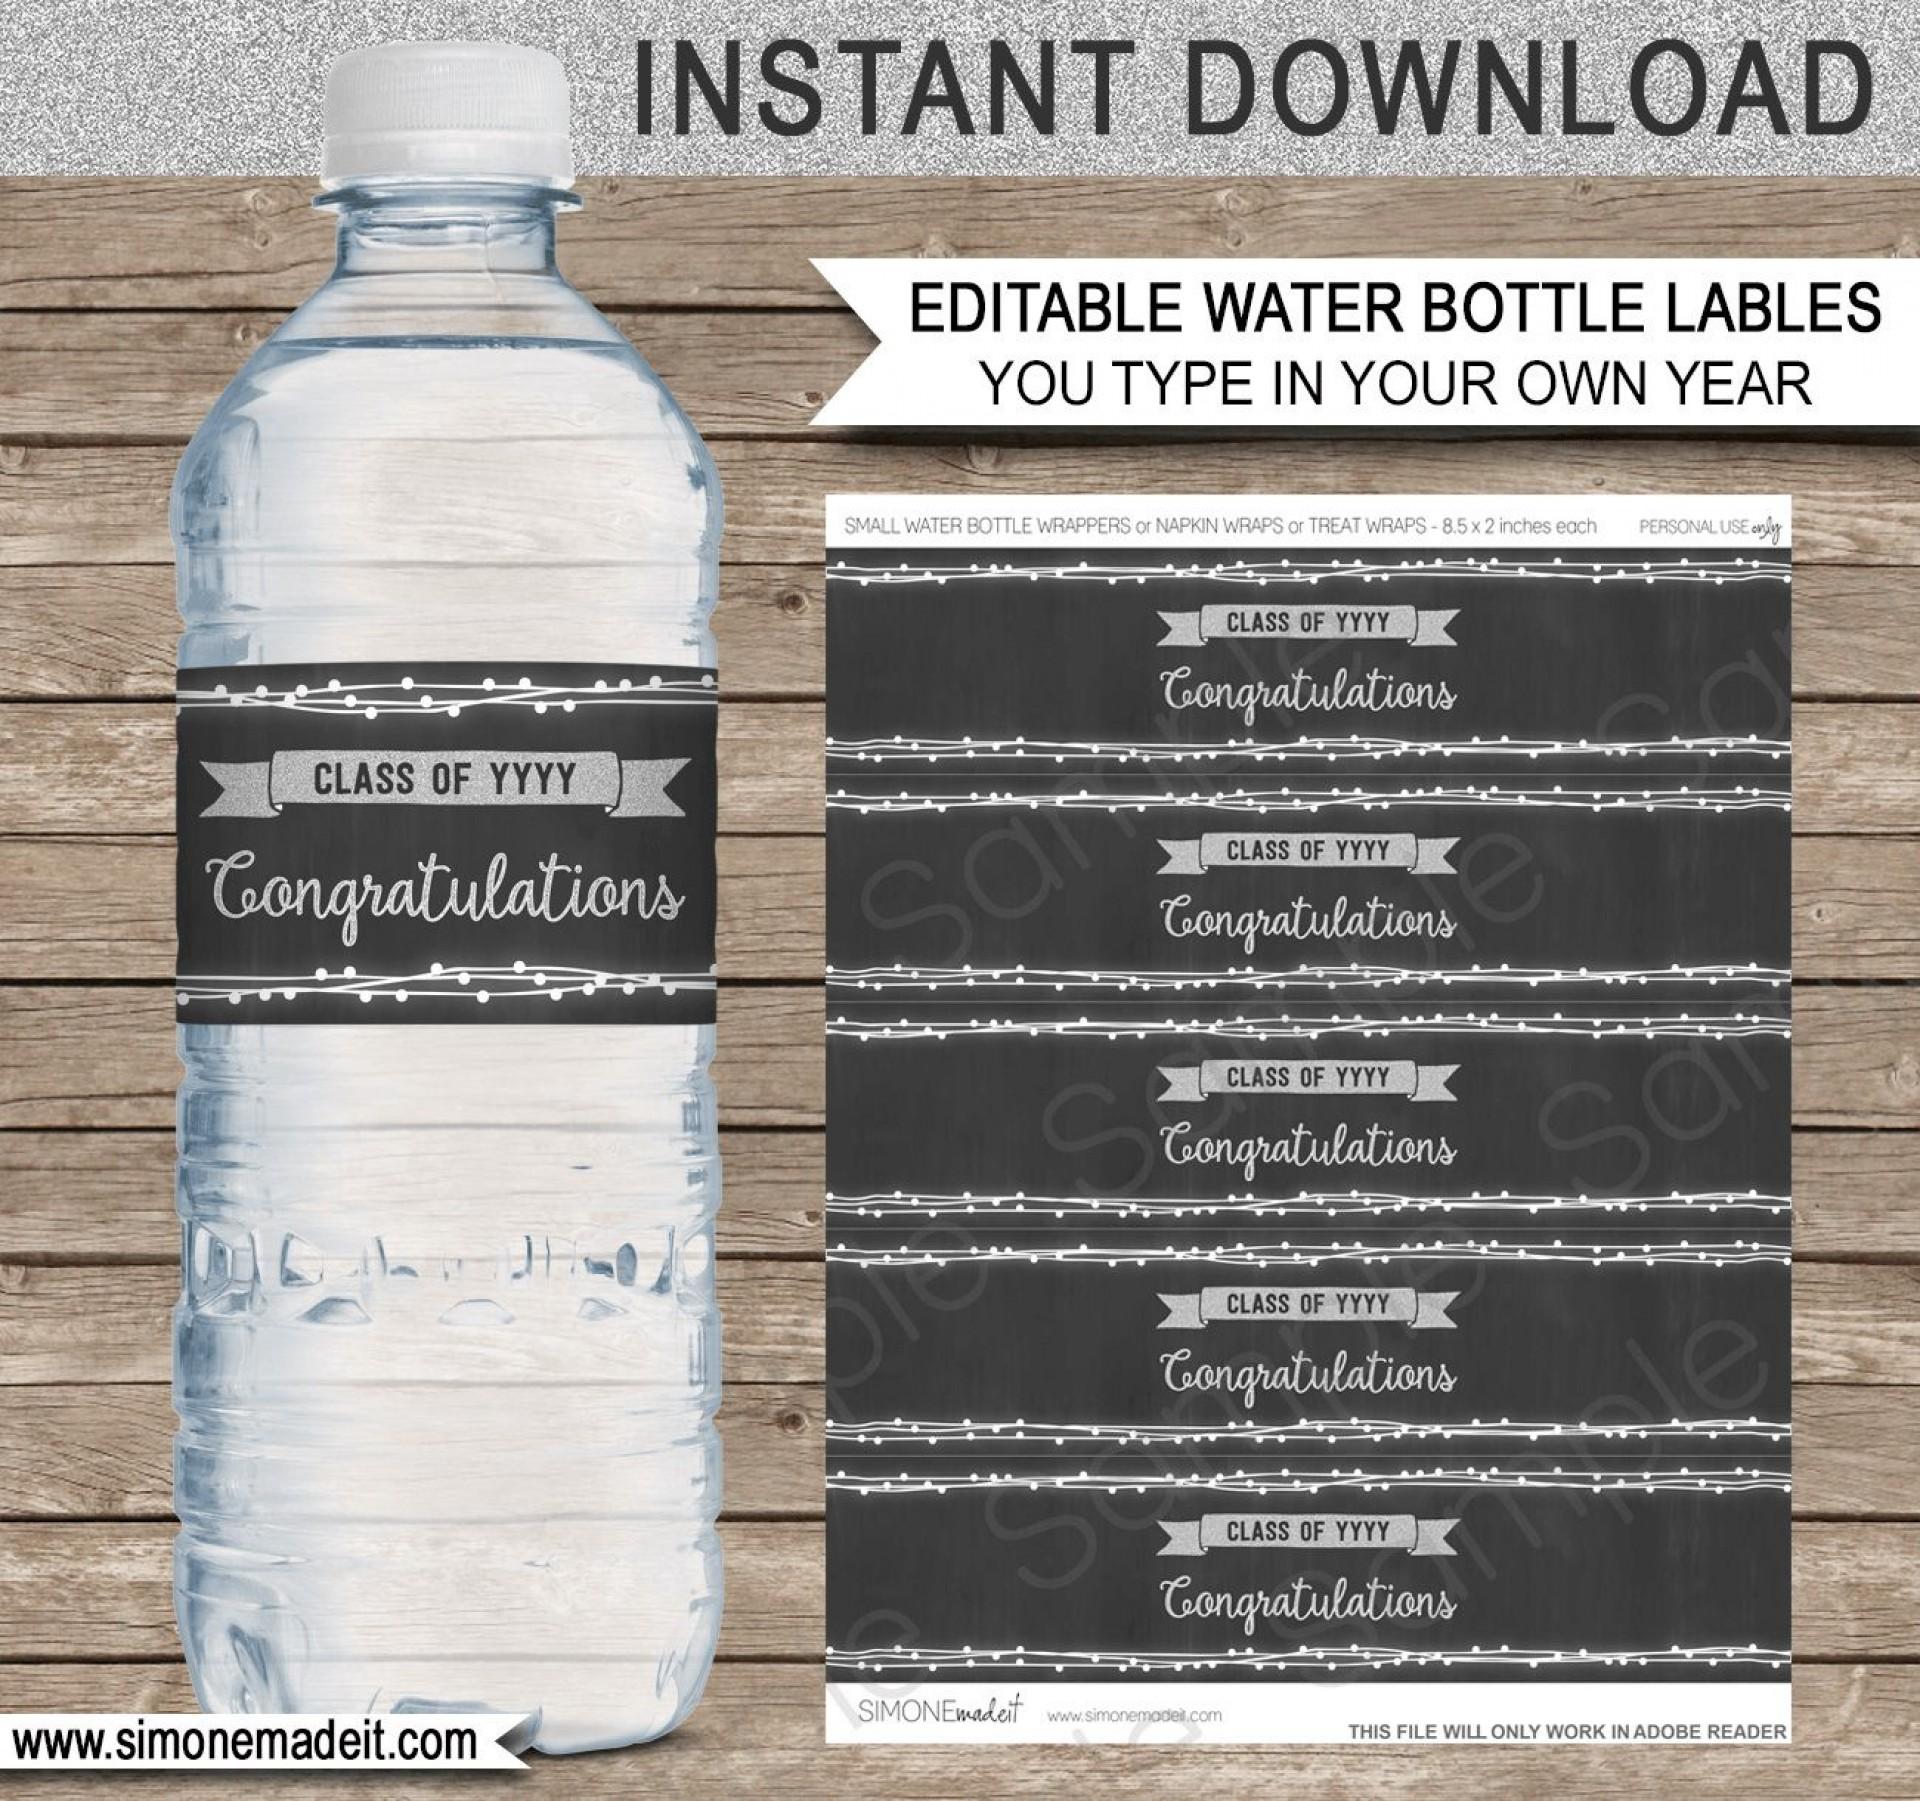 009 Imposing Water Bottle Label Template Free Inspiration  Word Superhero Photoshop1920